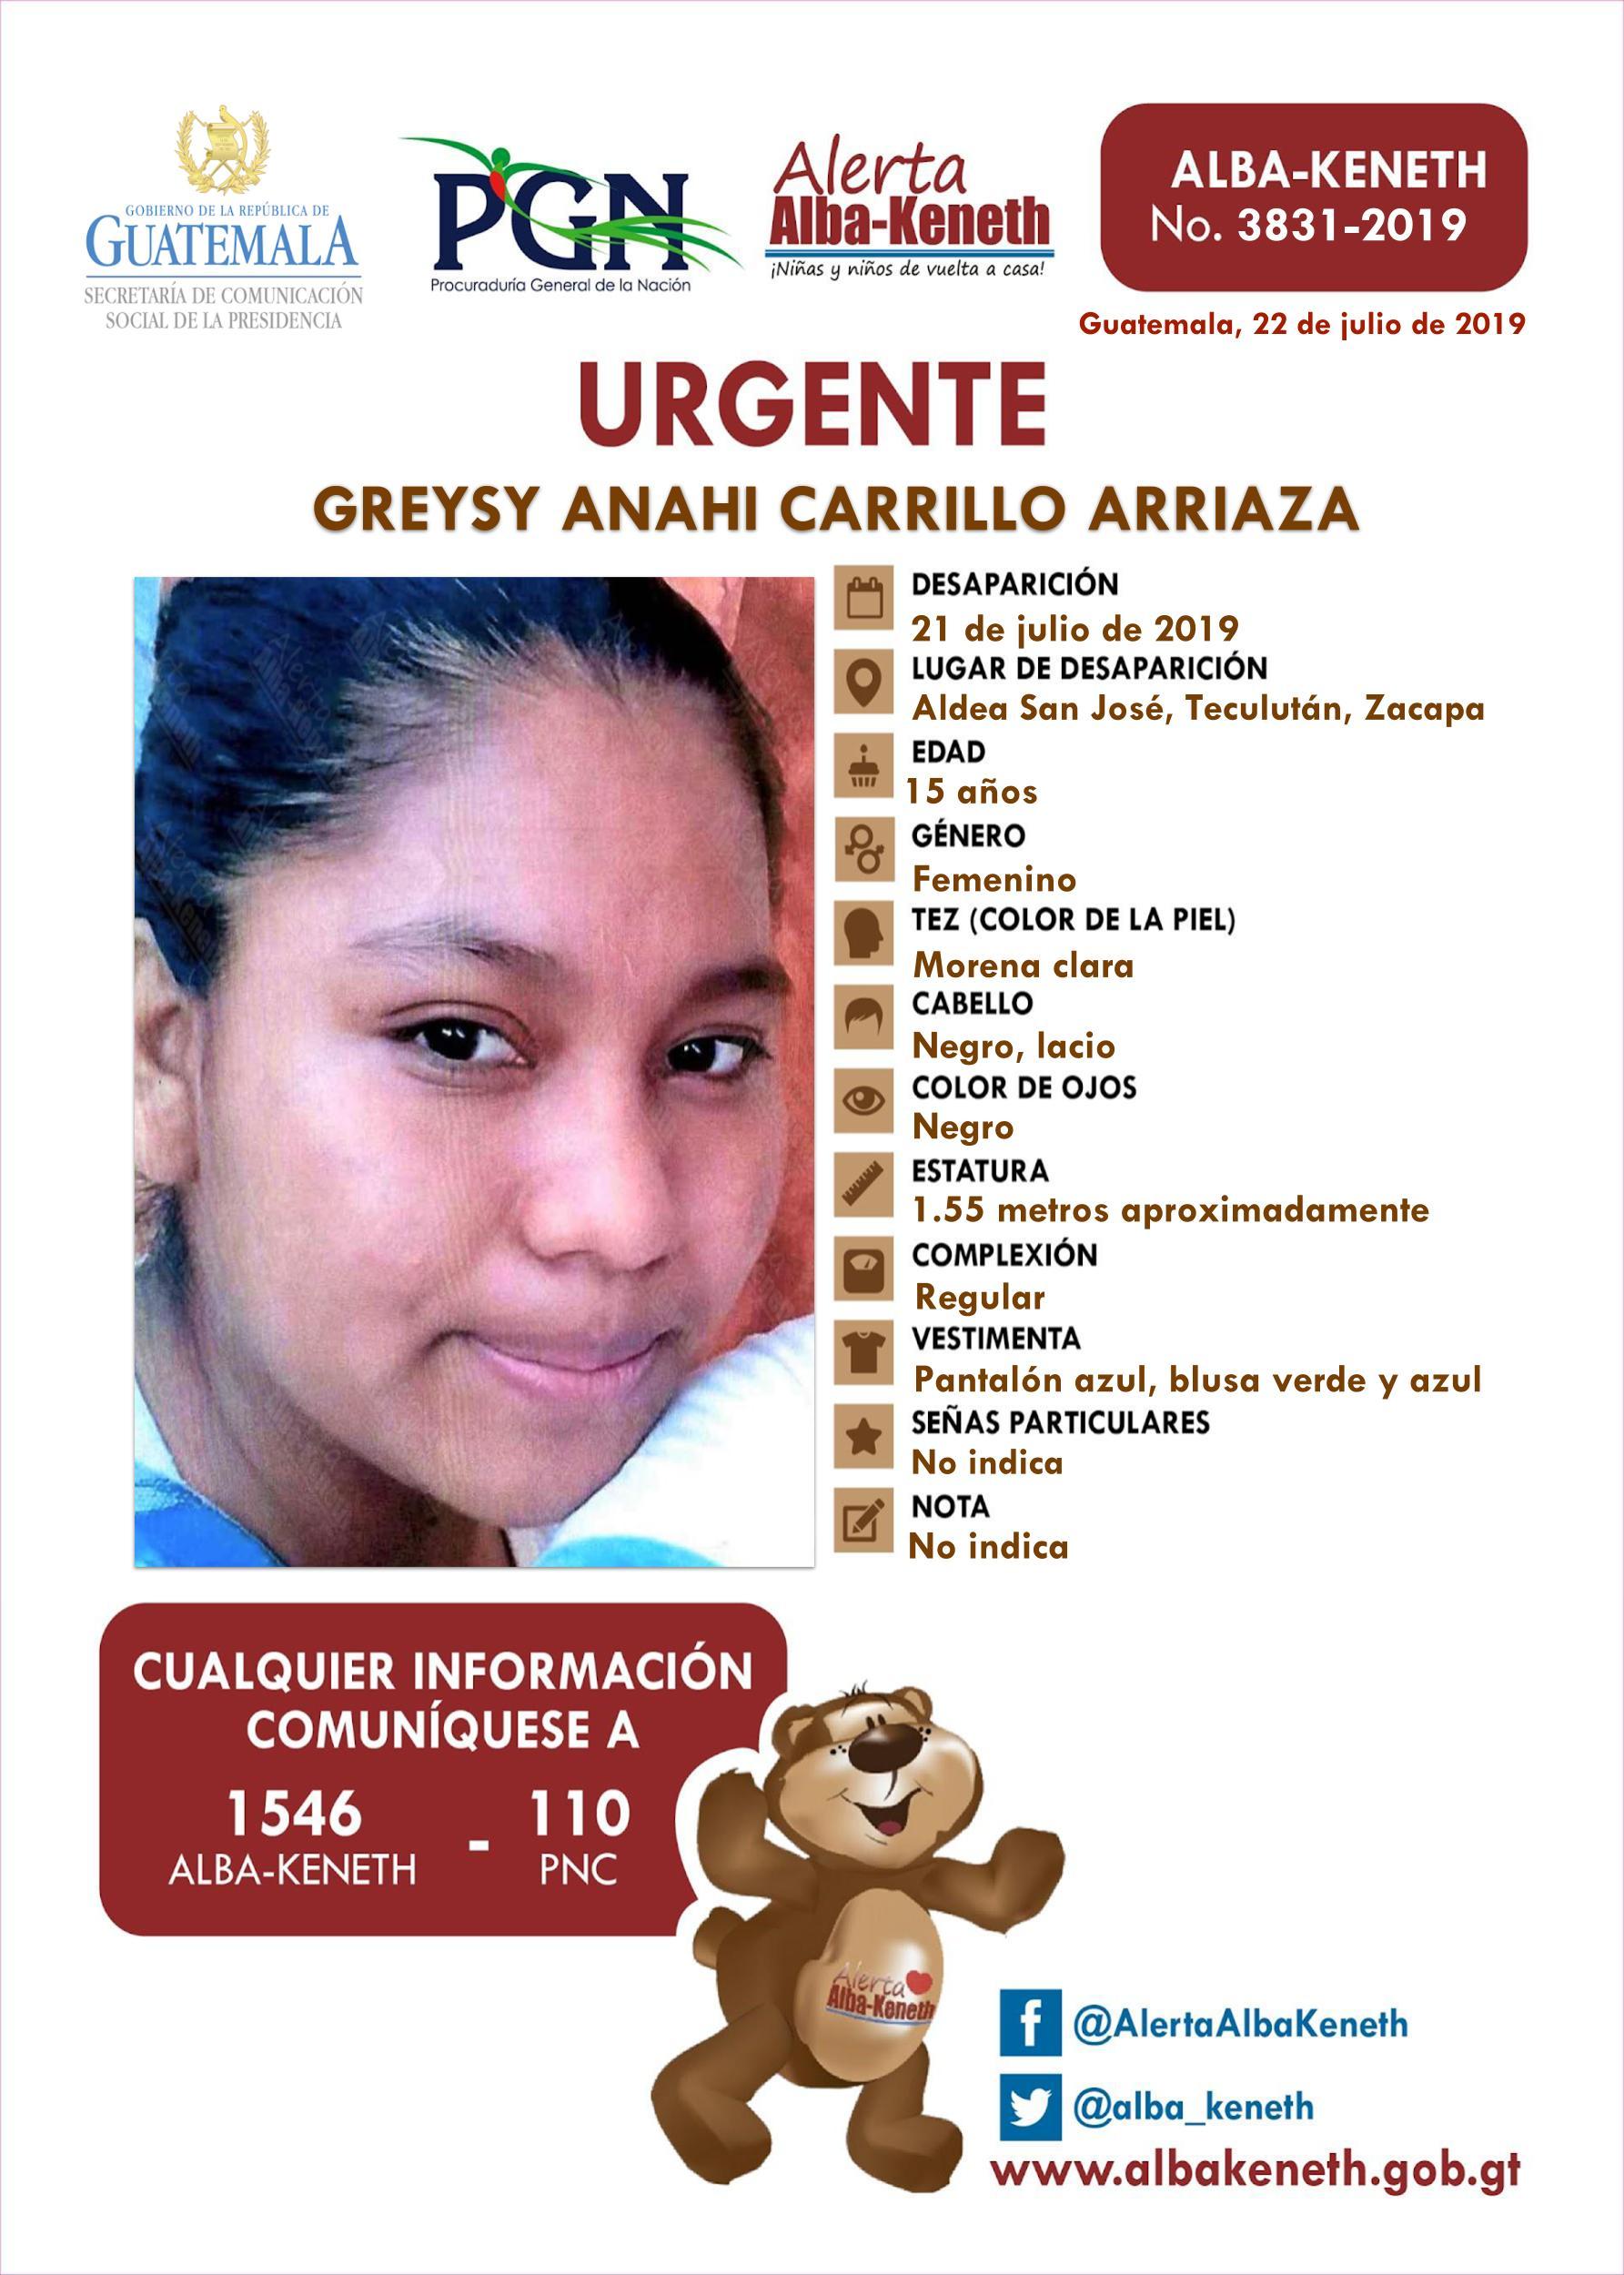 Greysy Anahi Carrillo Arriaza